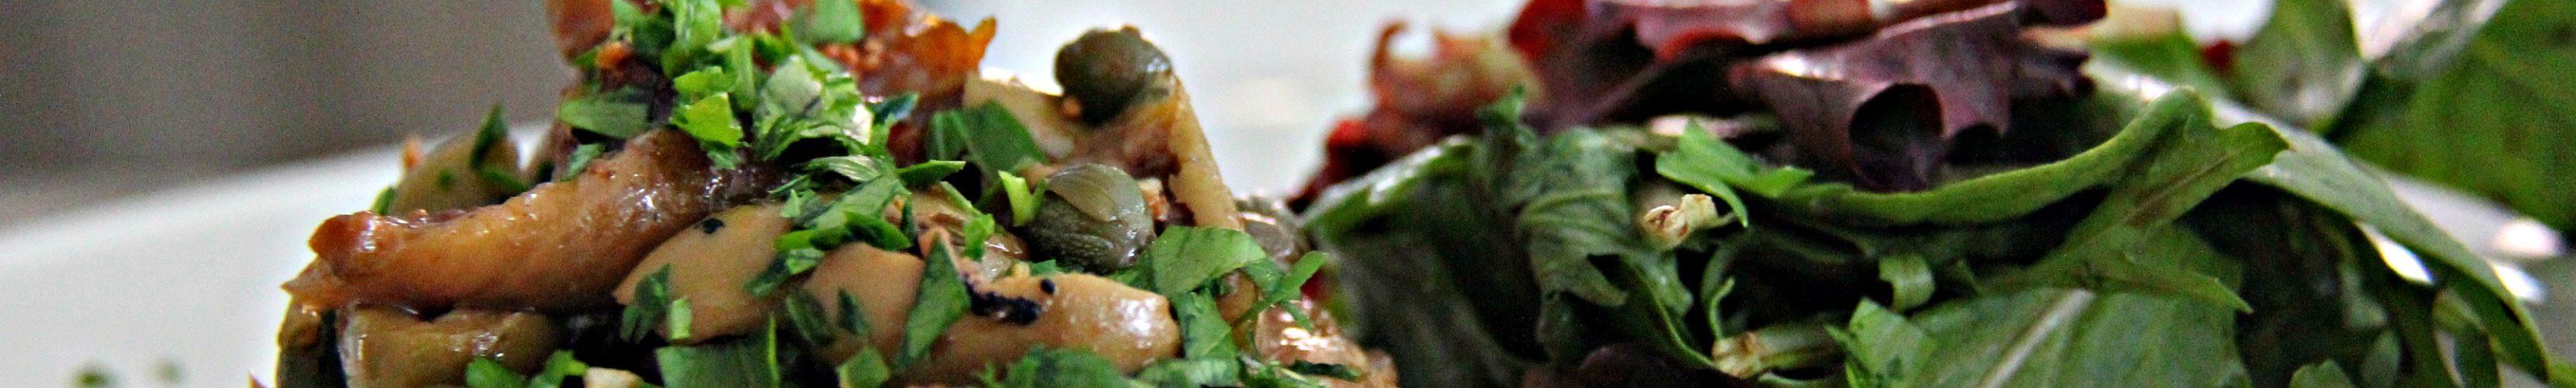 duBreton Boneless Pork Loin Chops Pork Marbella